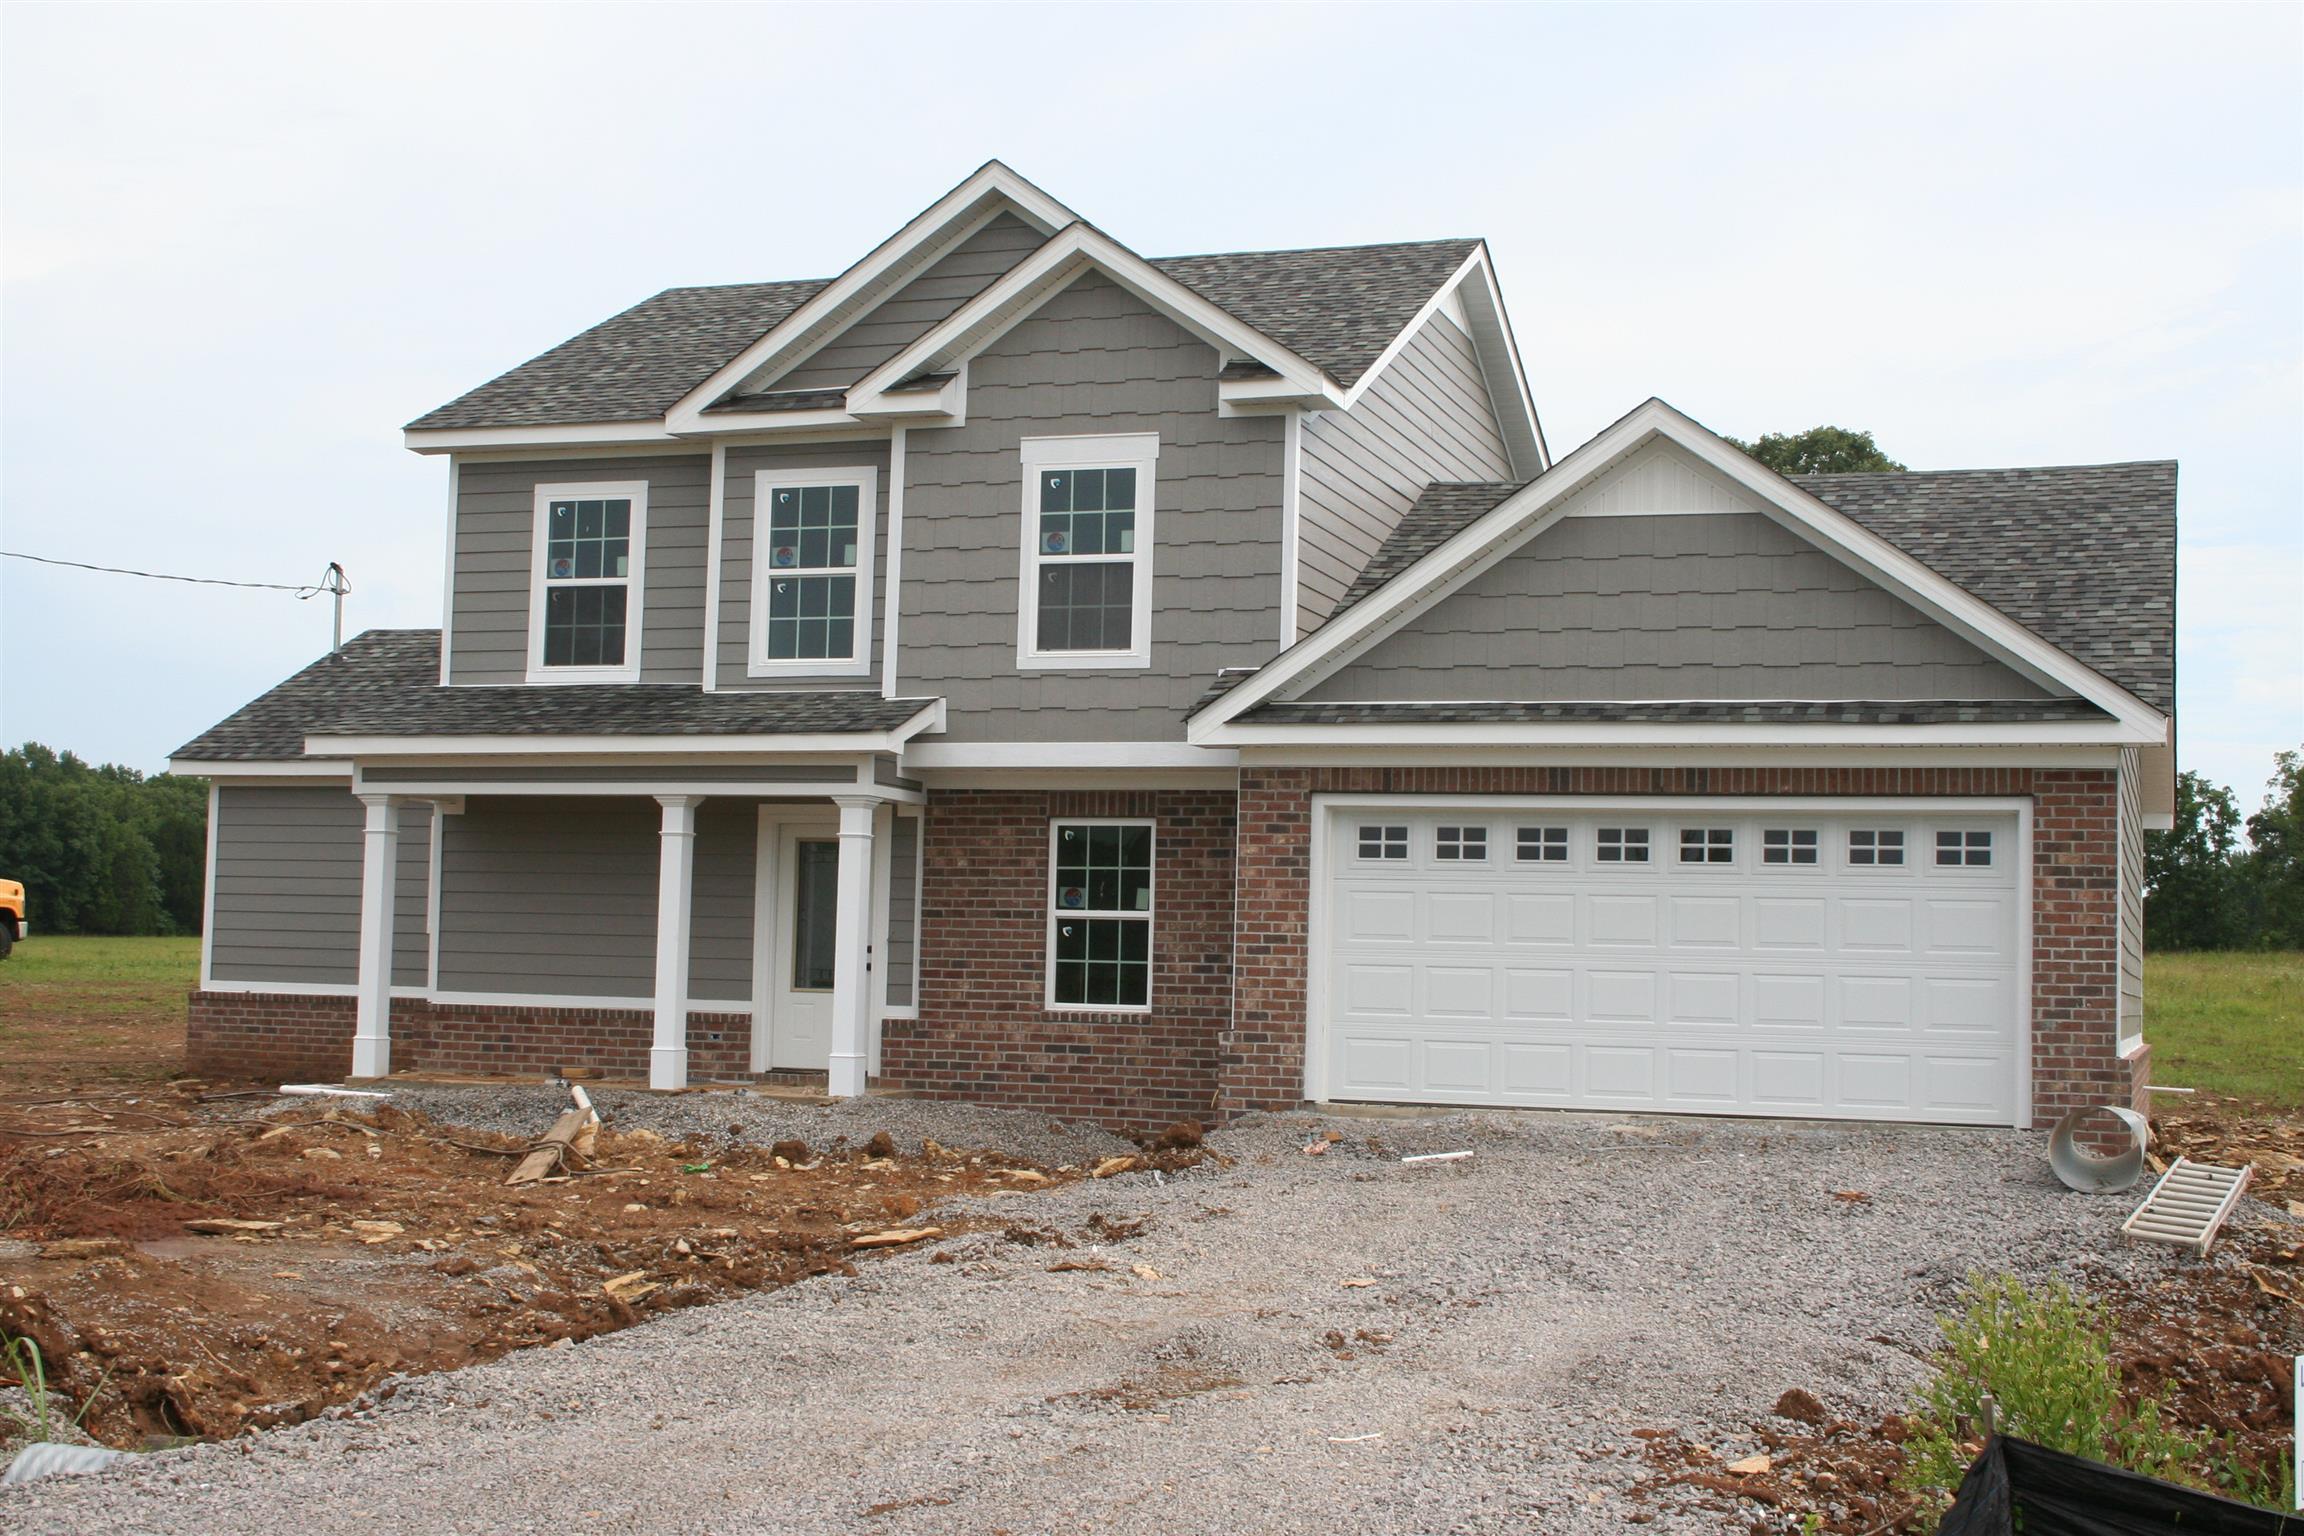 1185 Finely Beech Rd, Lewisburg, TN 37091 - Lewisburg, TN real estate listing